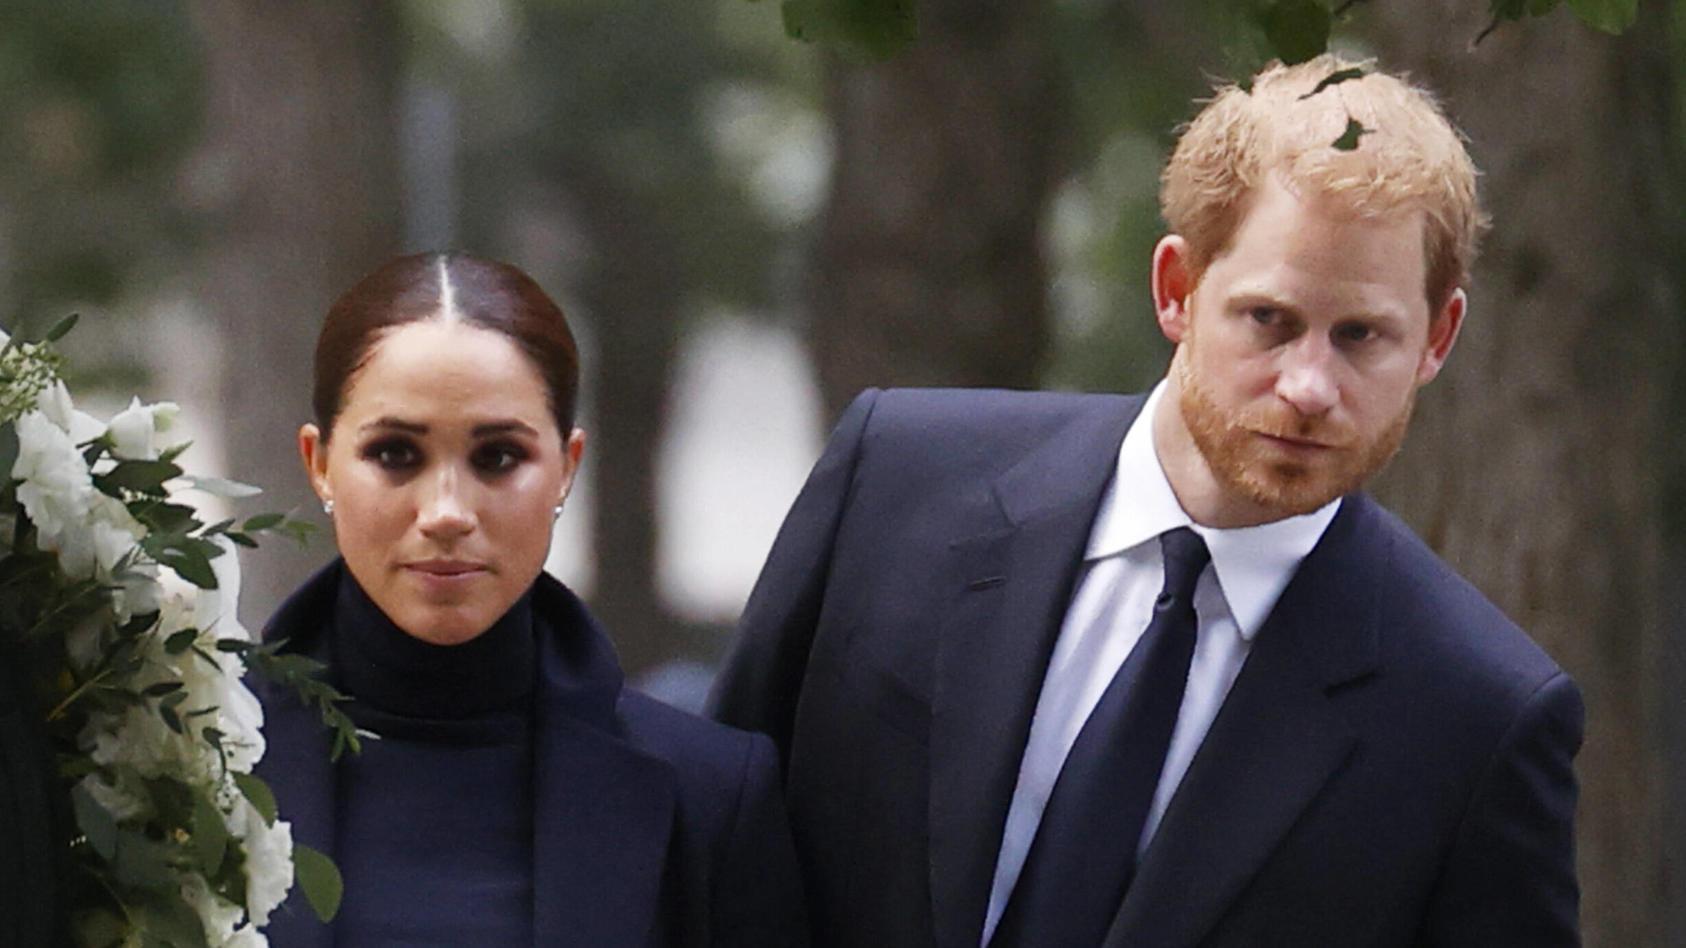 Hat Herzogin Meghan bald genug von Prinz Harry?